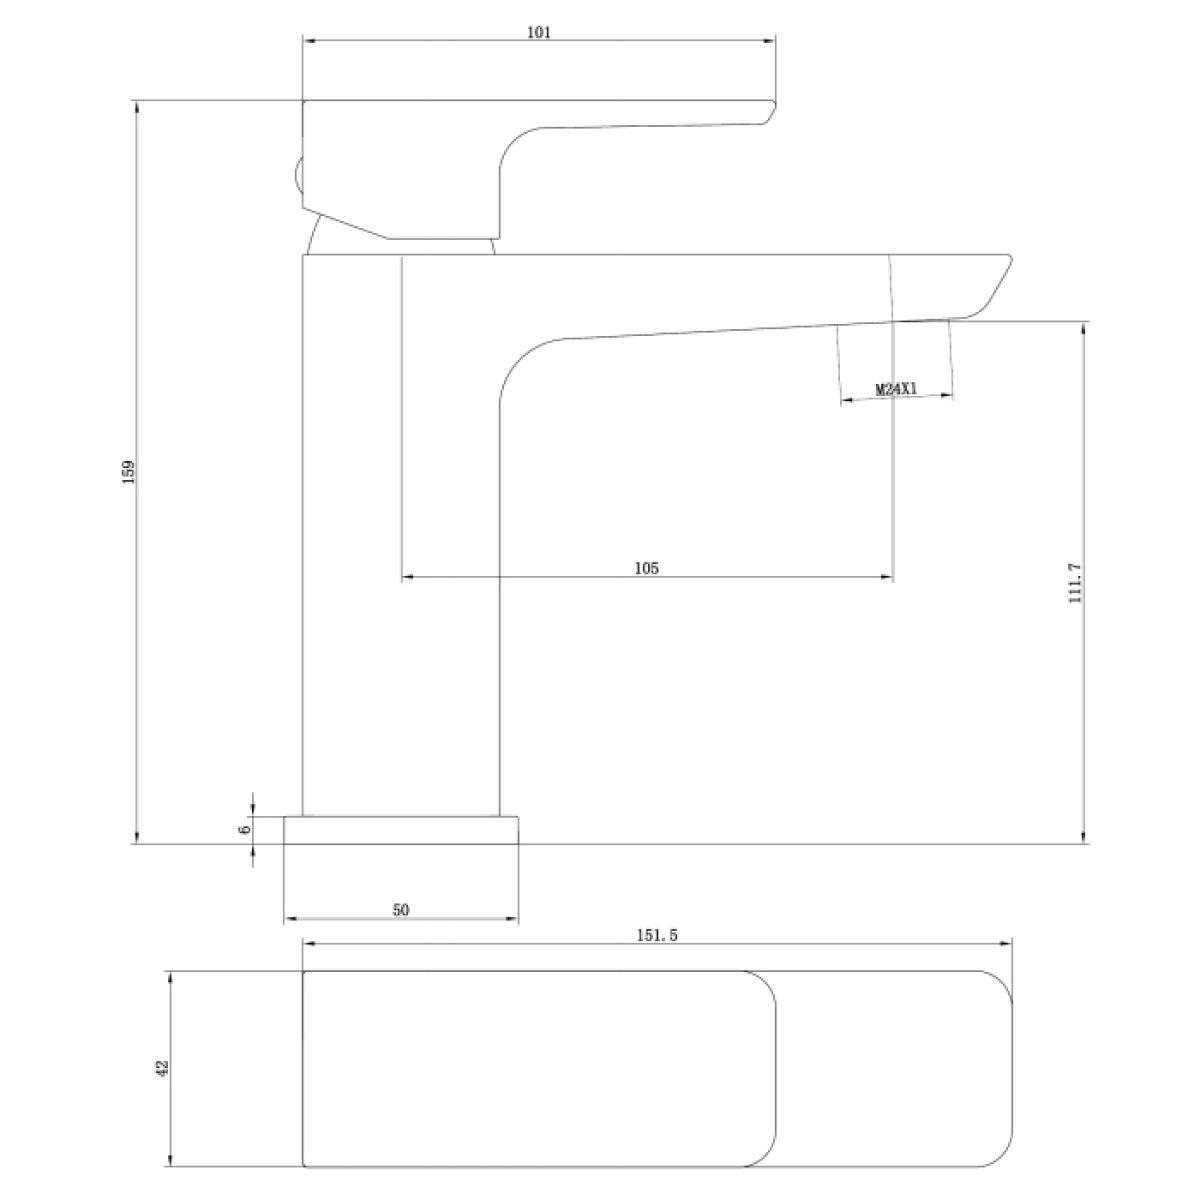 RAK Moon Chrome Mini Mono Basin Mixer Tap with Waste Measurements